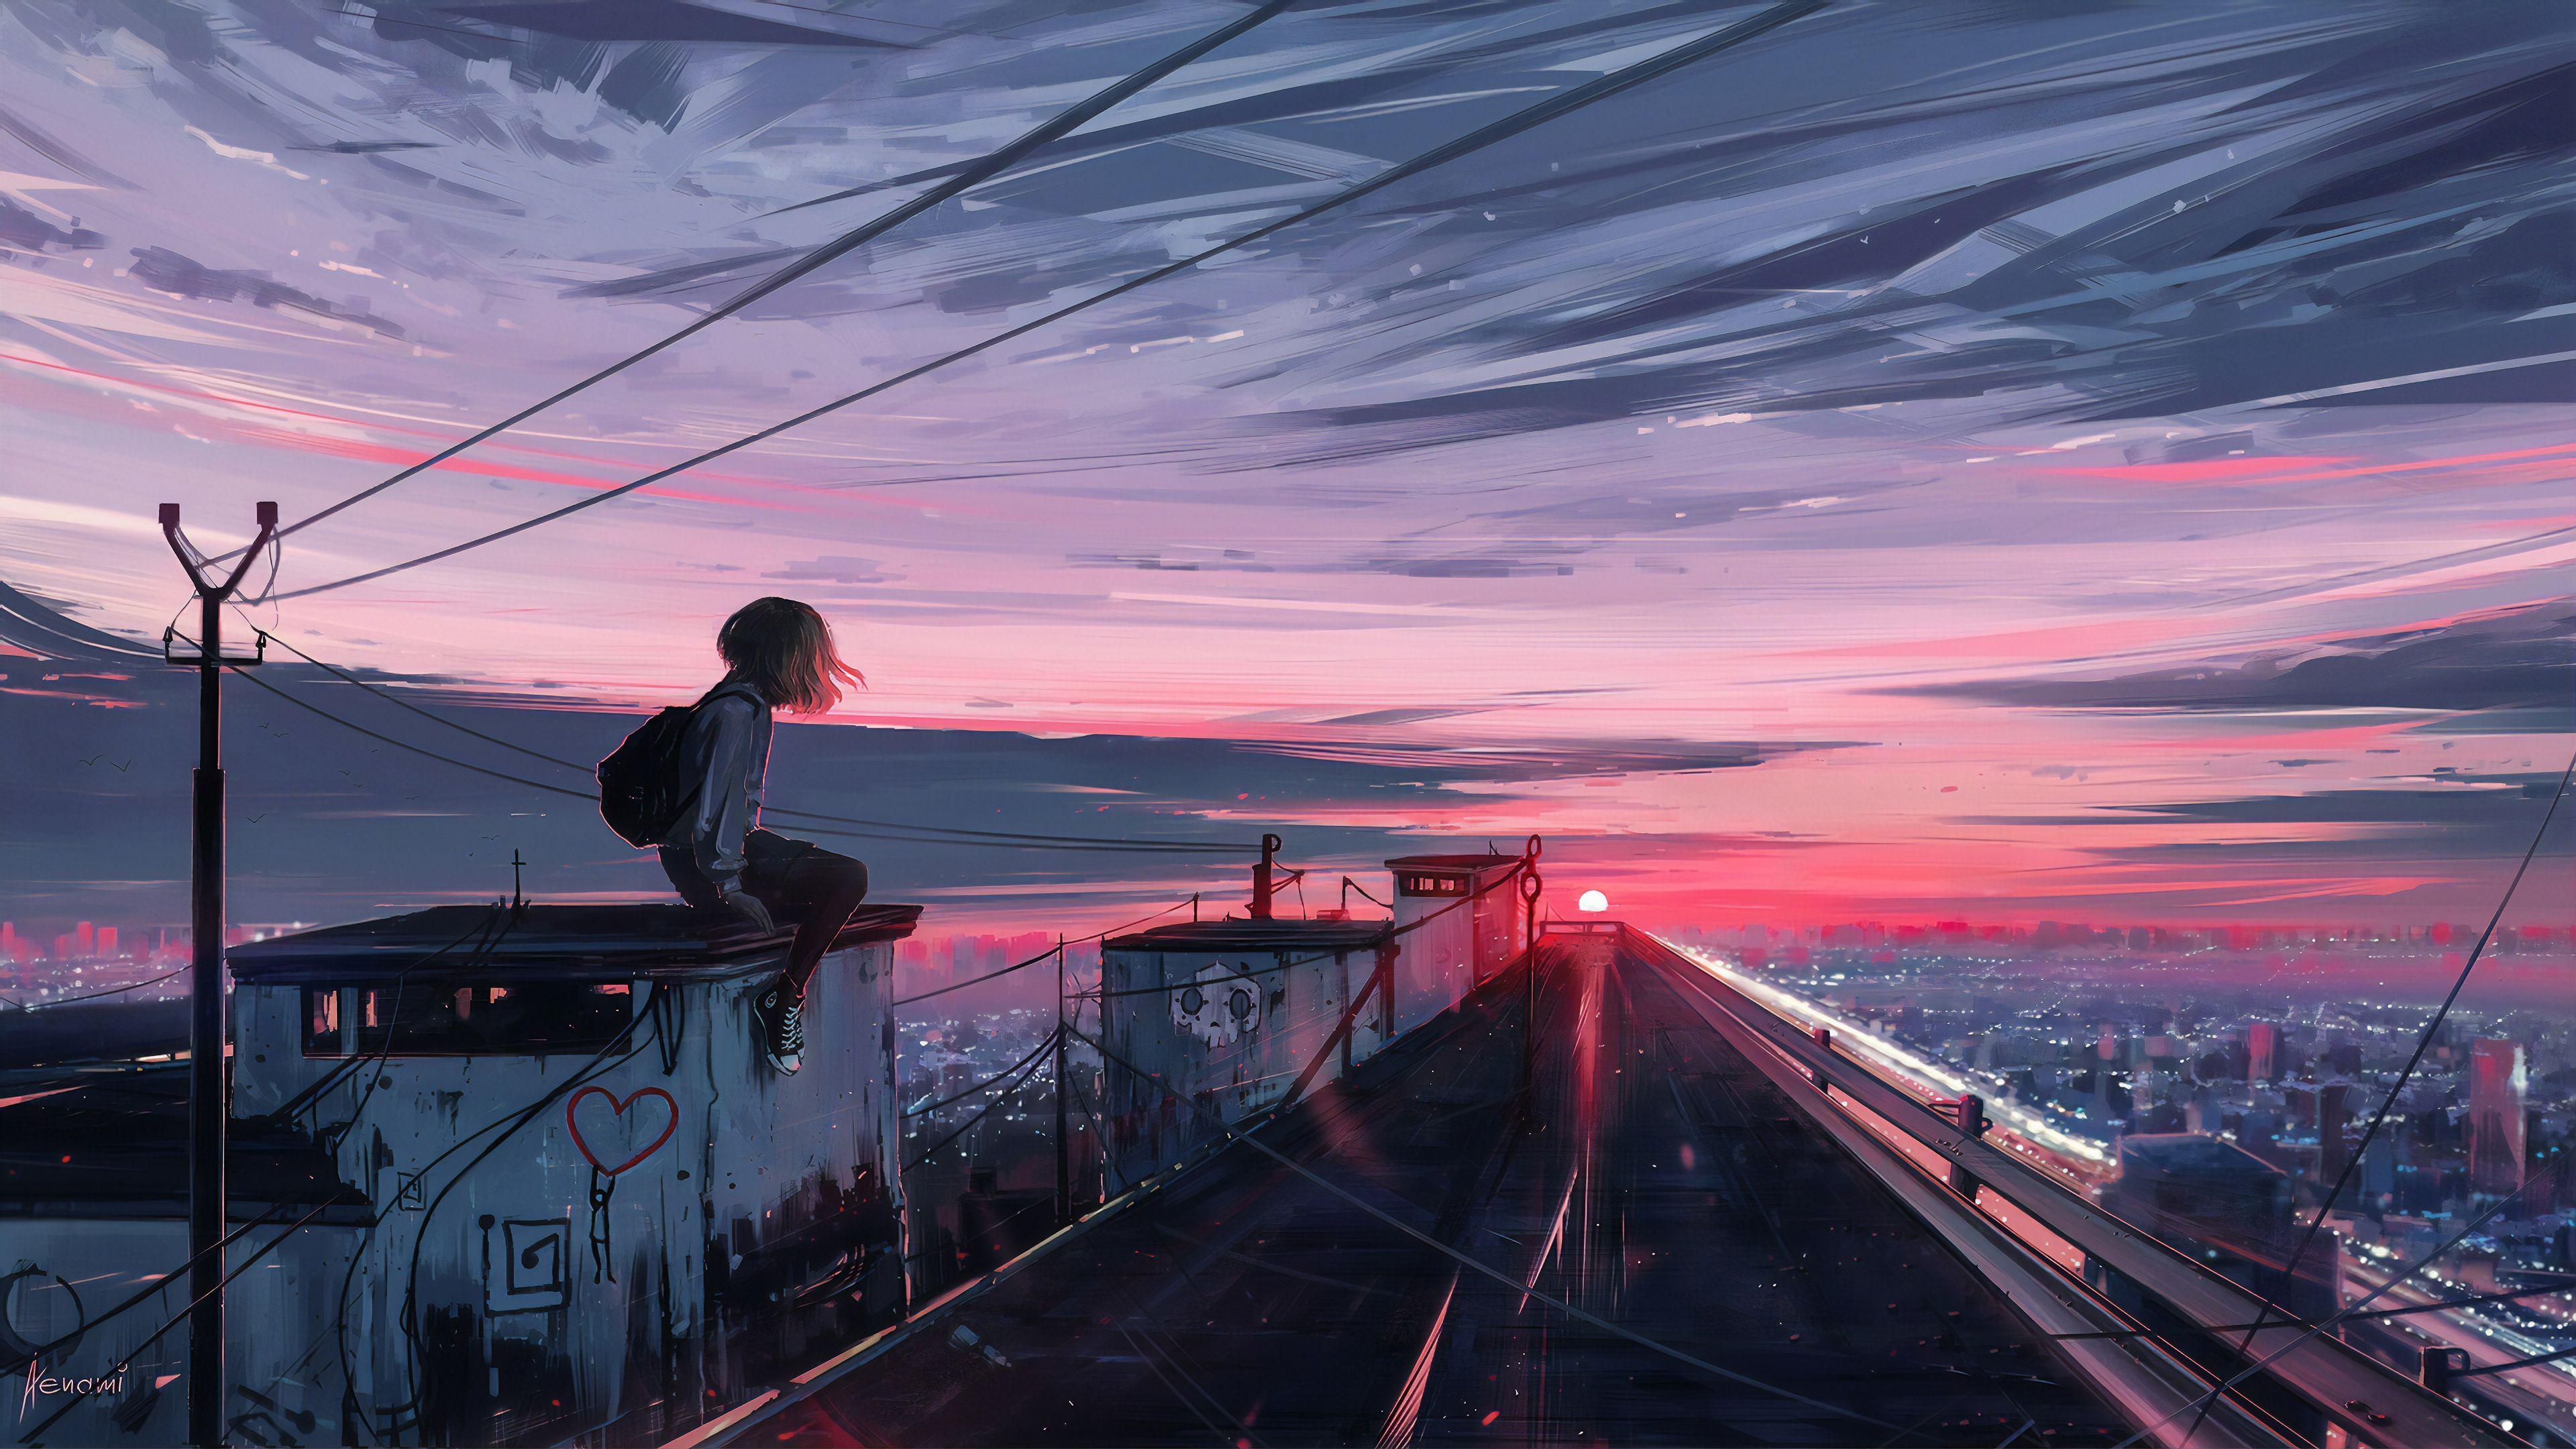 Anime Wallpapers Backgrounds Desktop 4k In 2020 Anime Scenery Scenery Wallpaper Anime Scenery Wallpaper